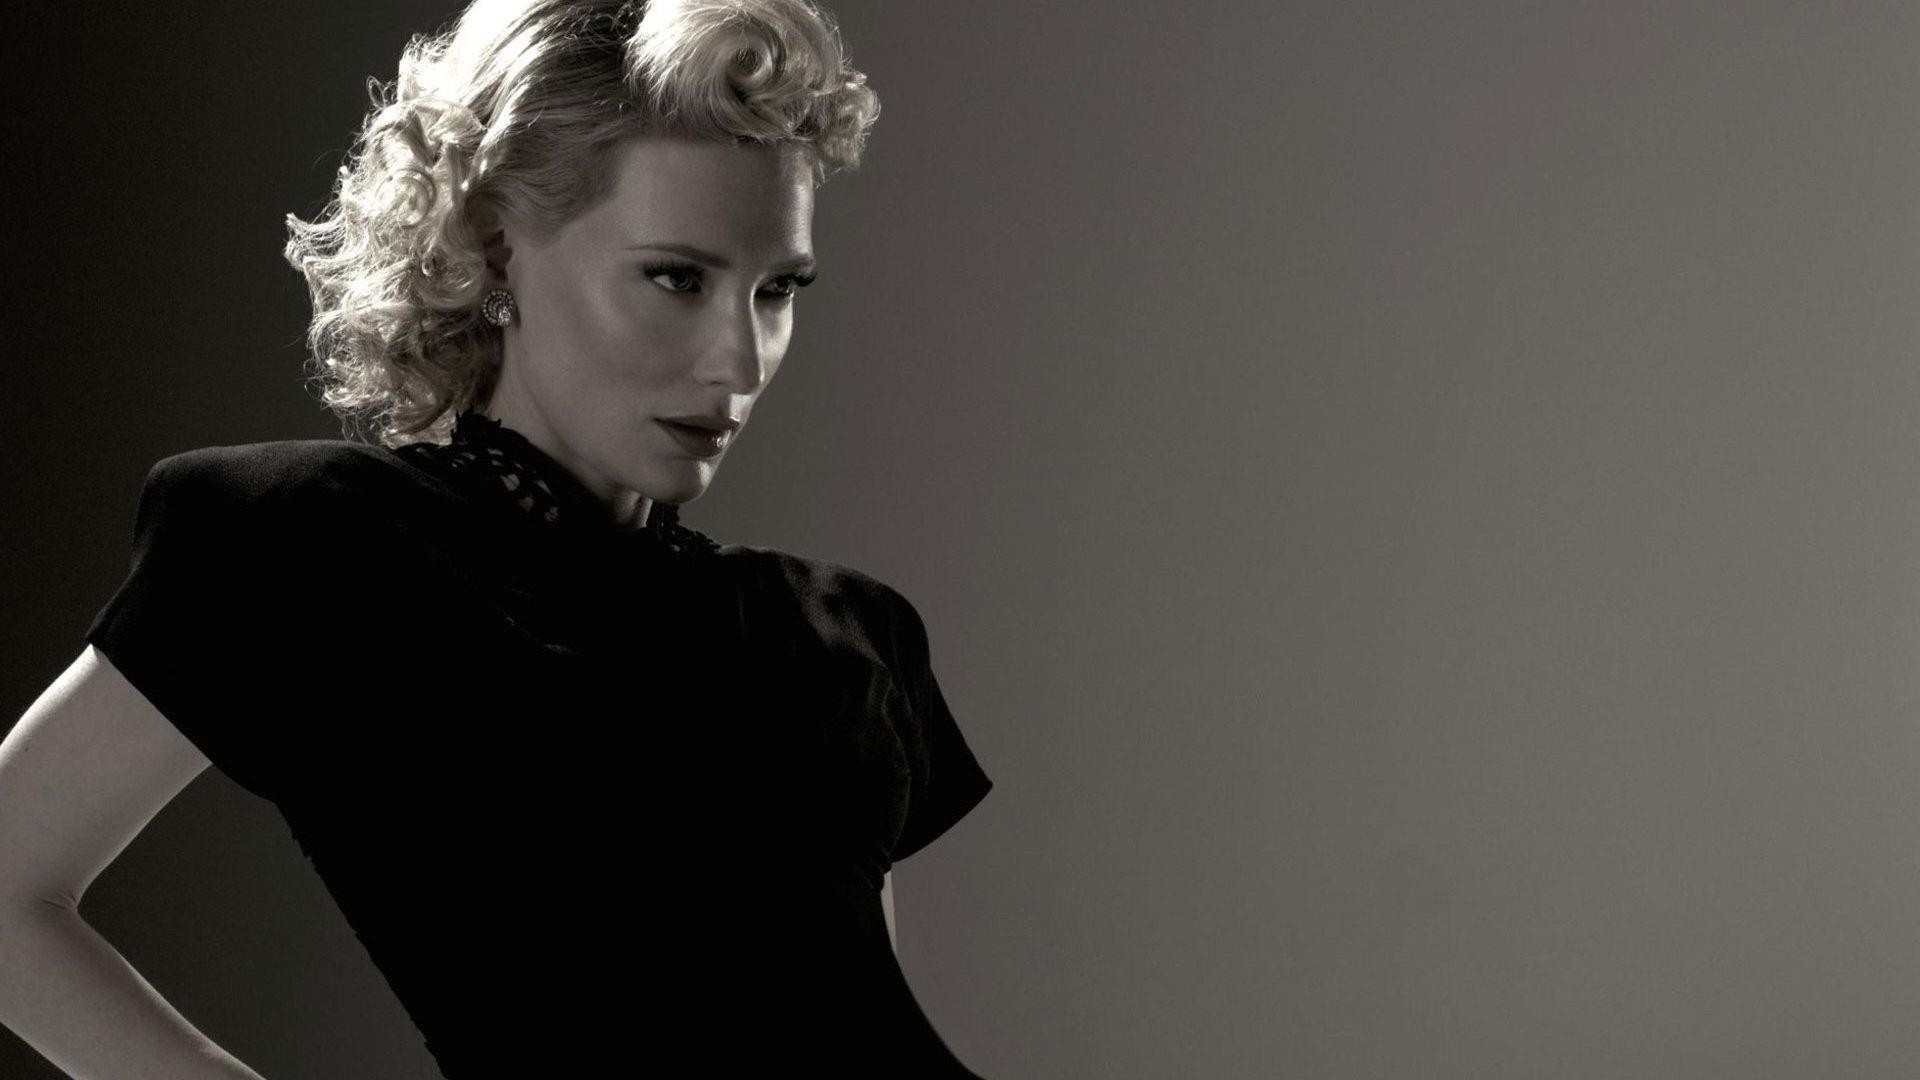 Sexy Cate Blanchett Wallpaper 1920x1080 20762